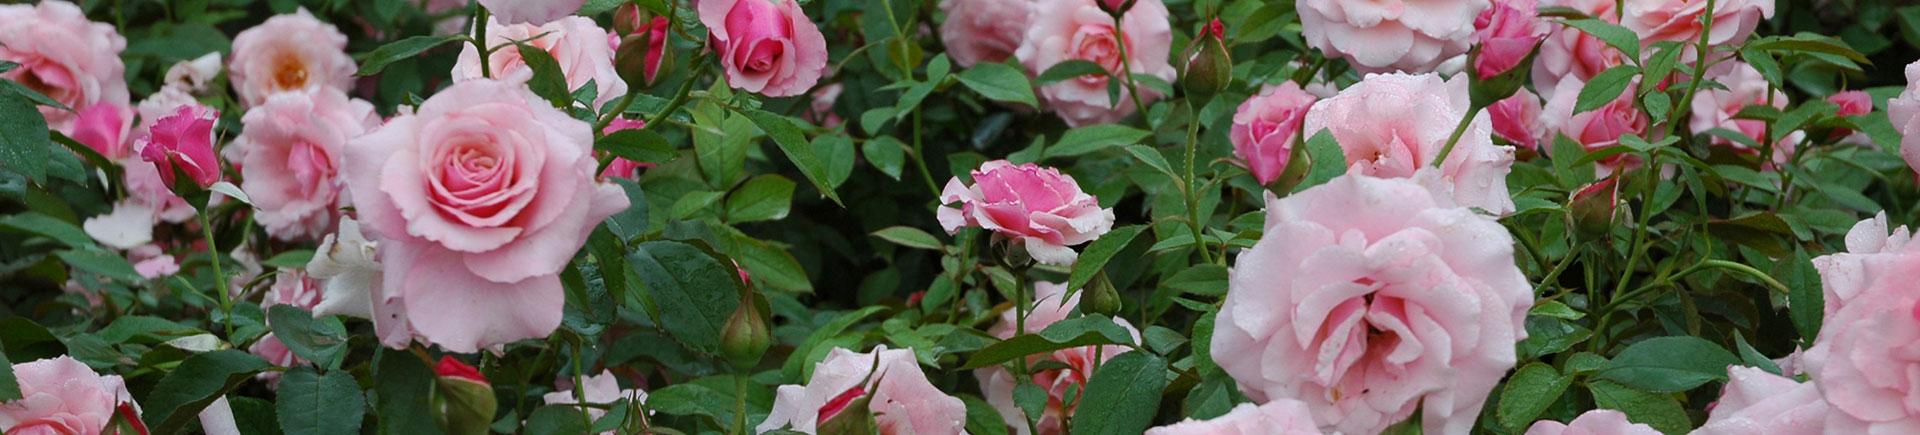 Roses_1920_435